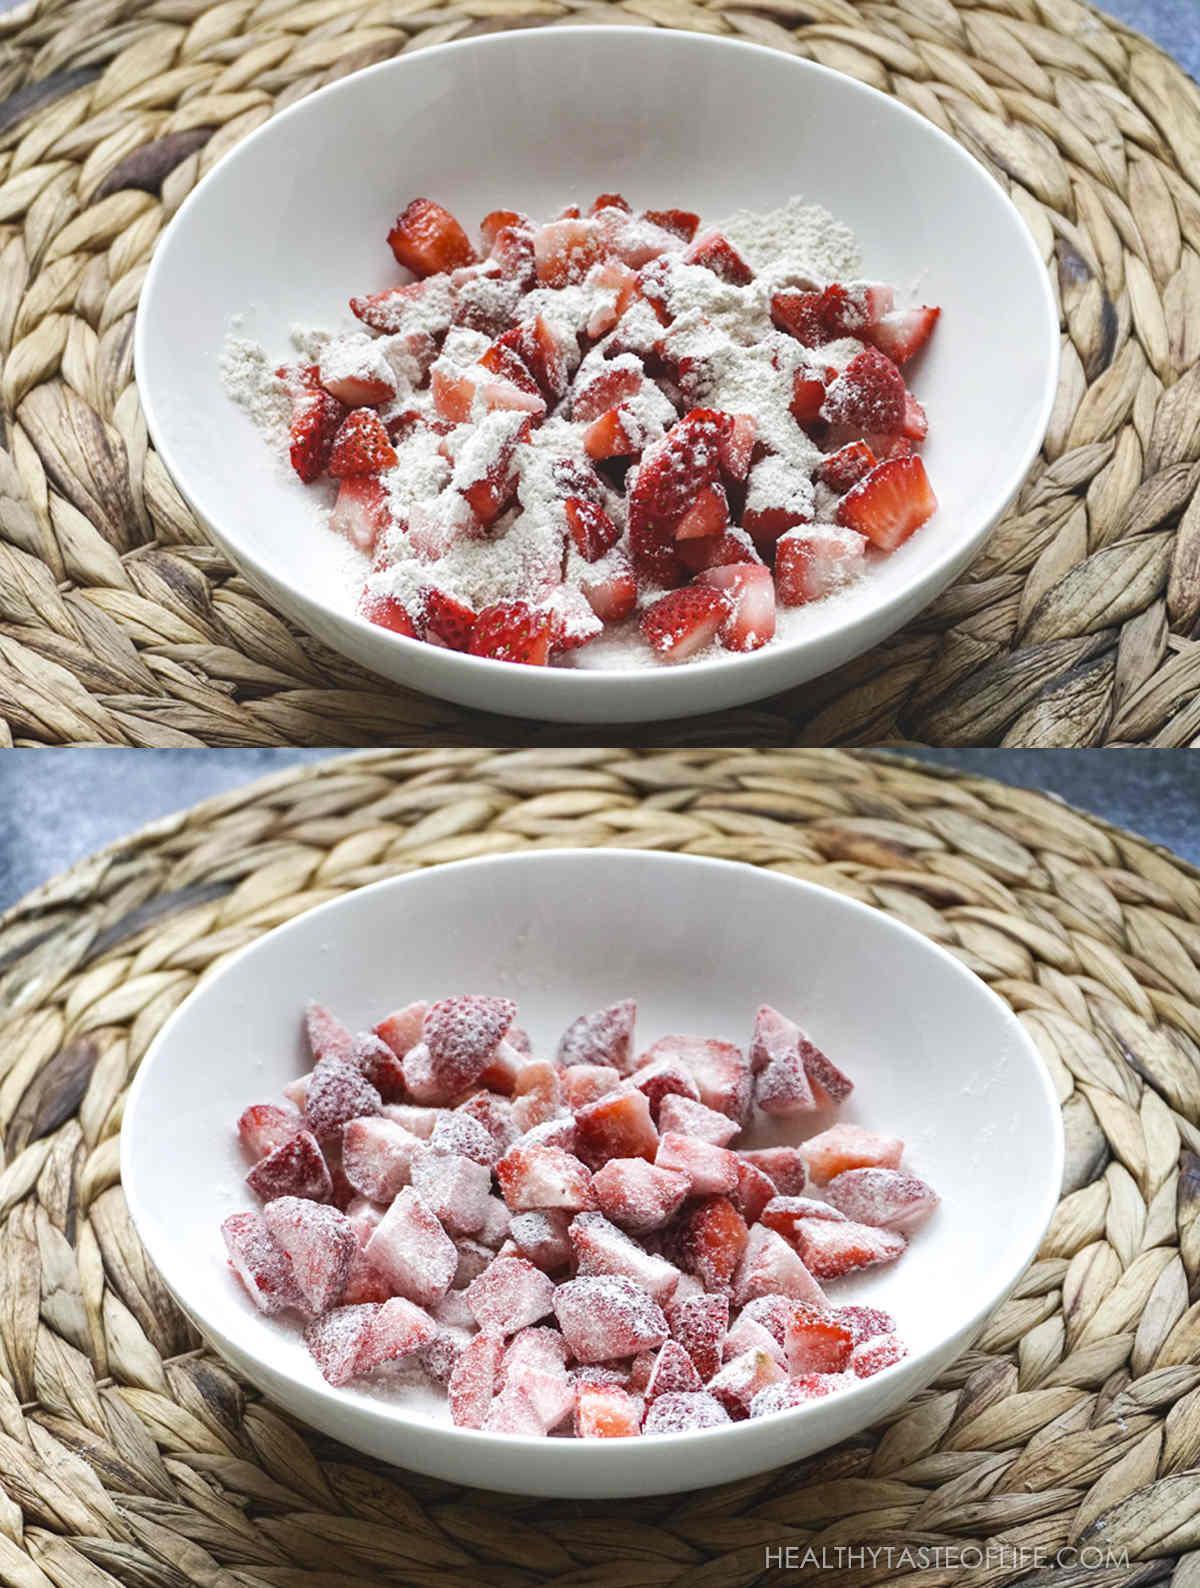 Diced frozen strawberries with gluten free flour.